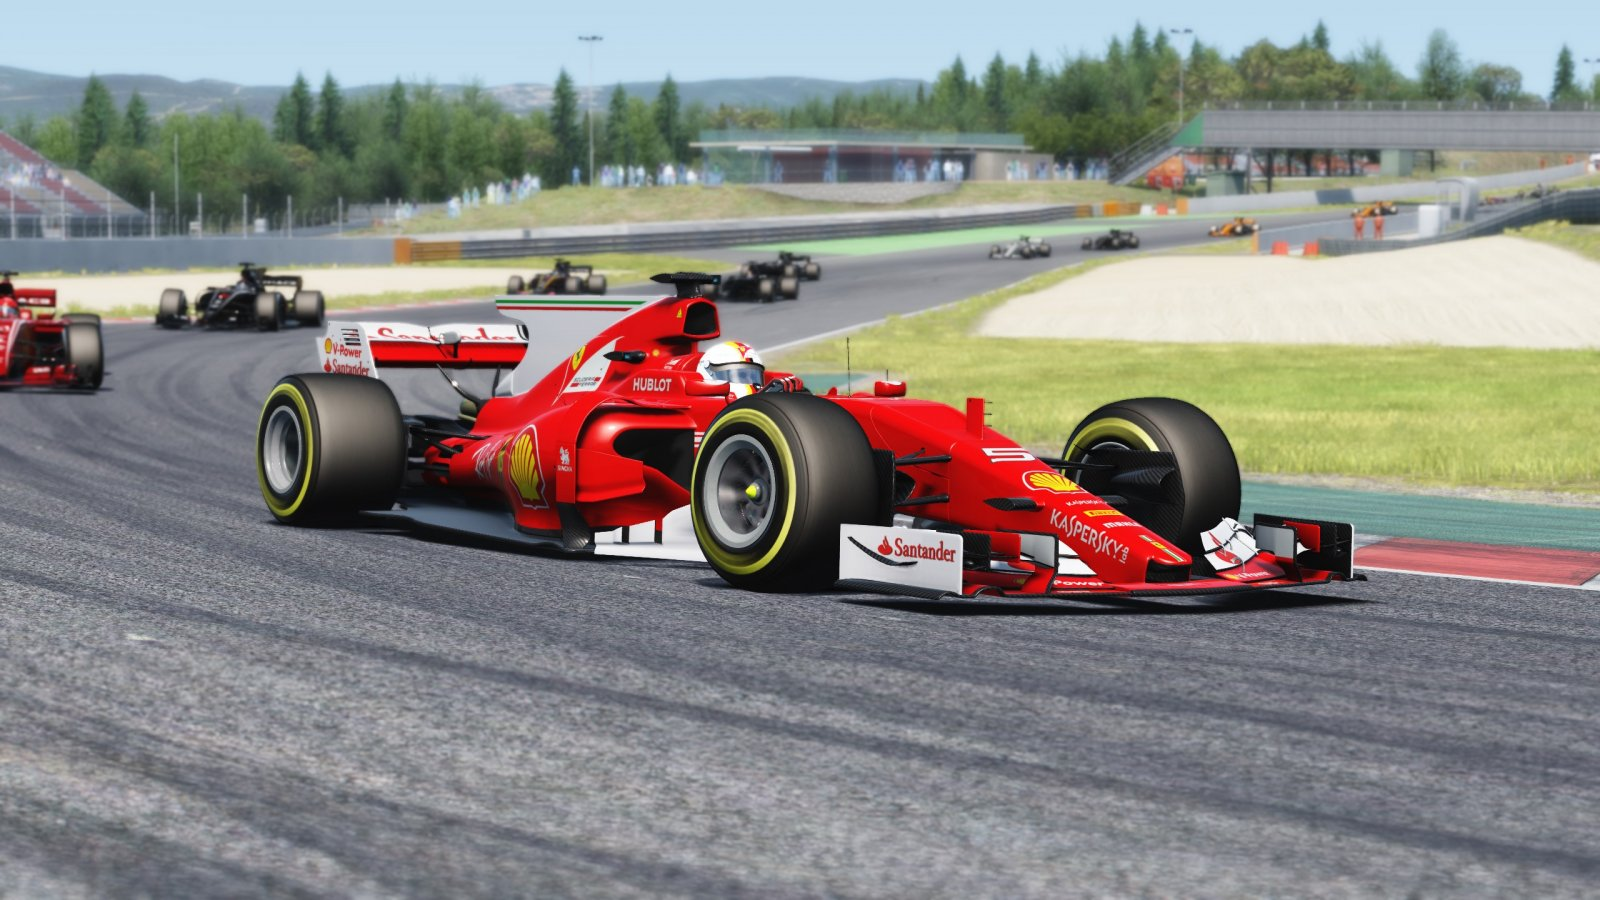 Screenshot-rss-formula-hybrid-2017-s1-ks-barcelona-11-3-117-22-0-45.jpg